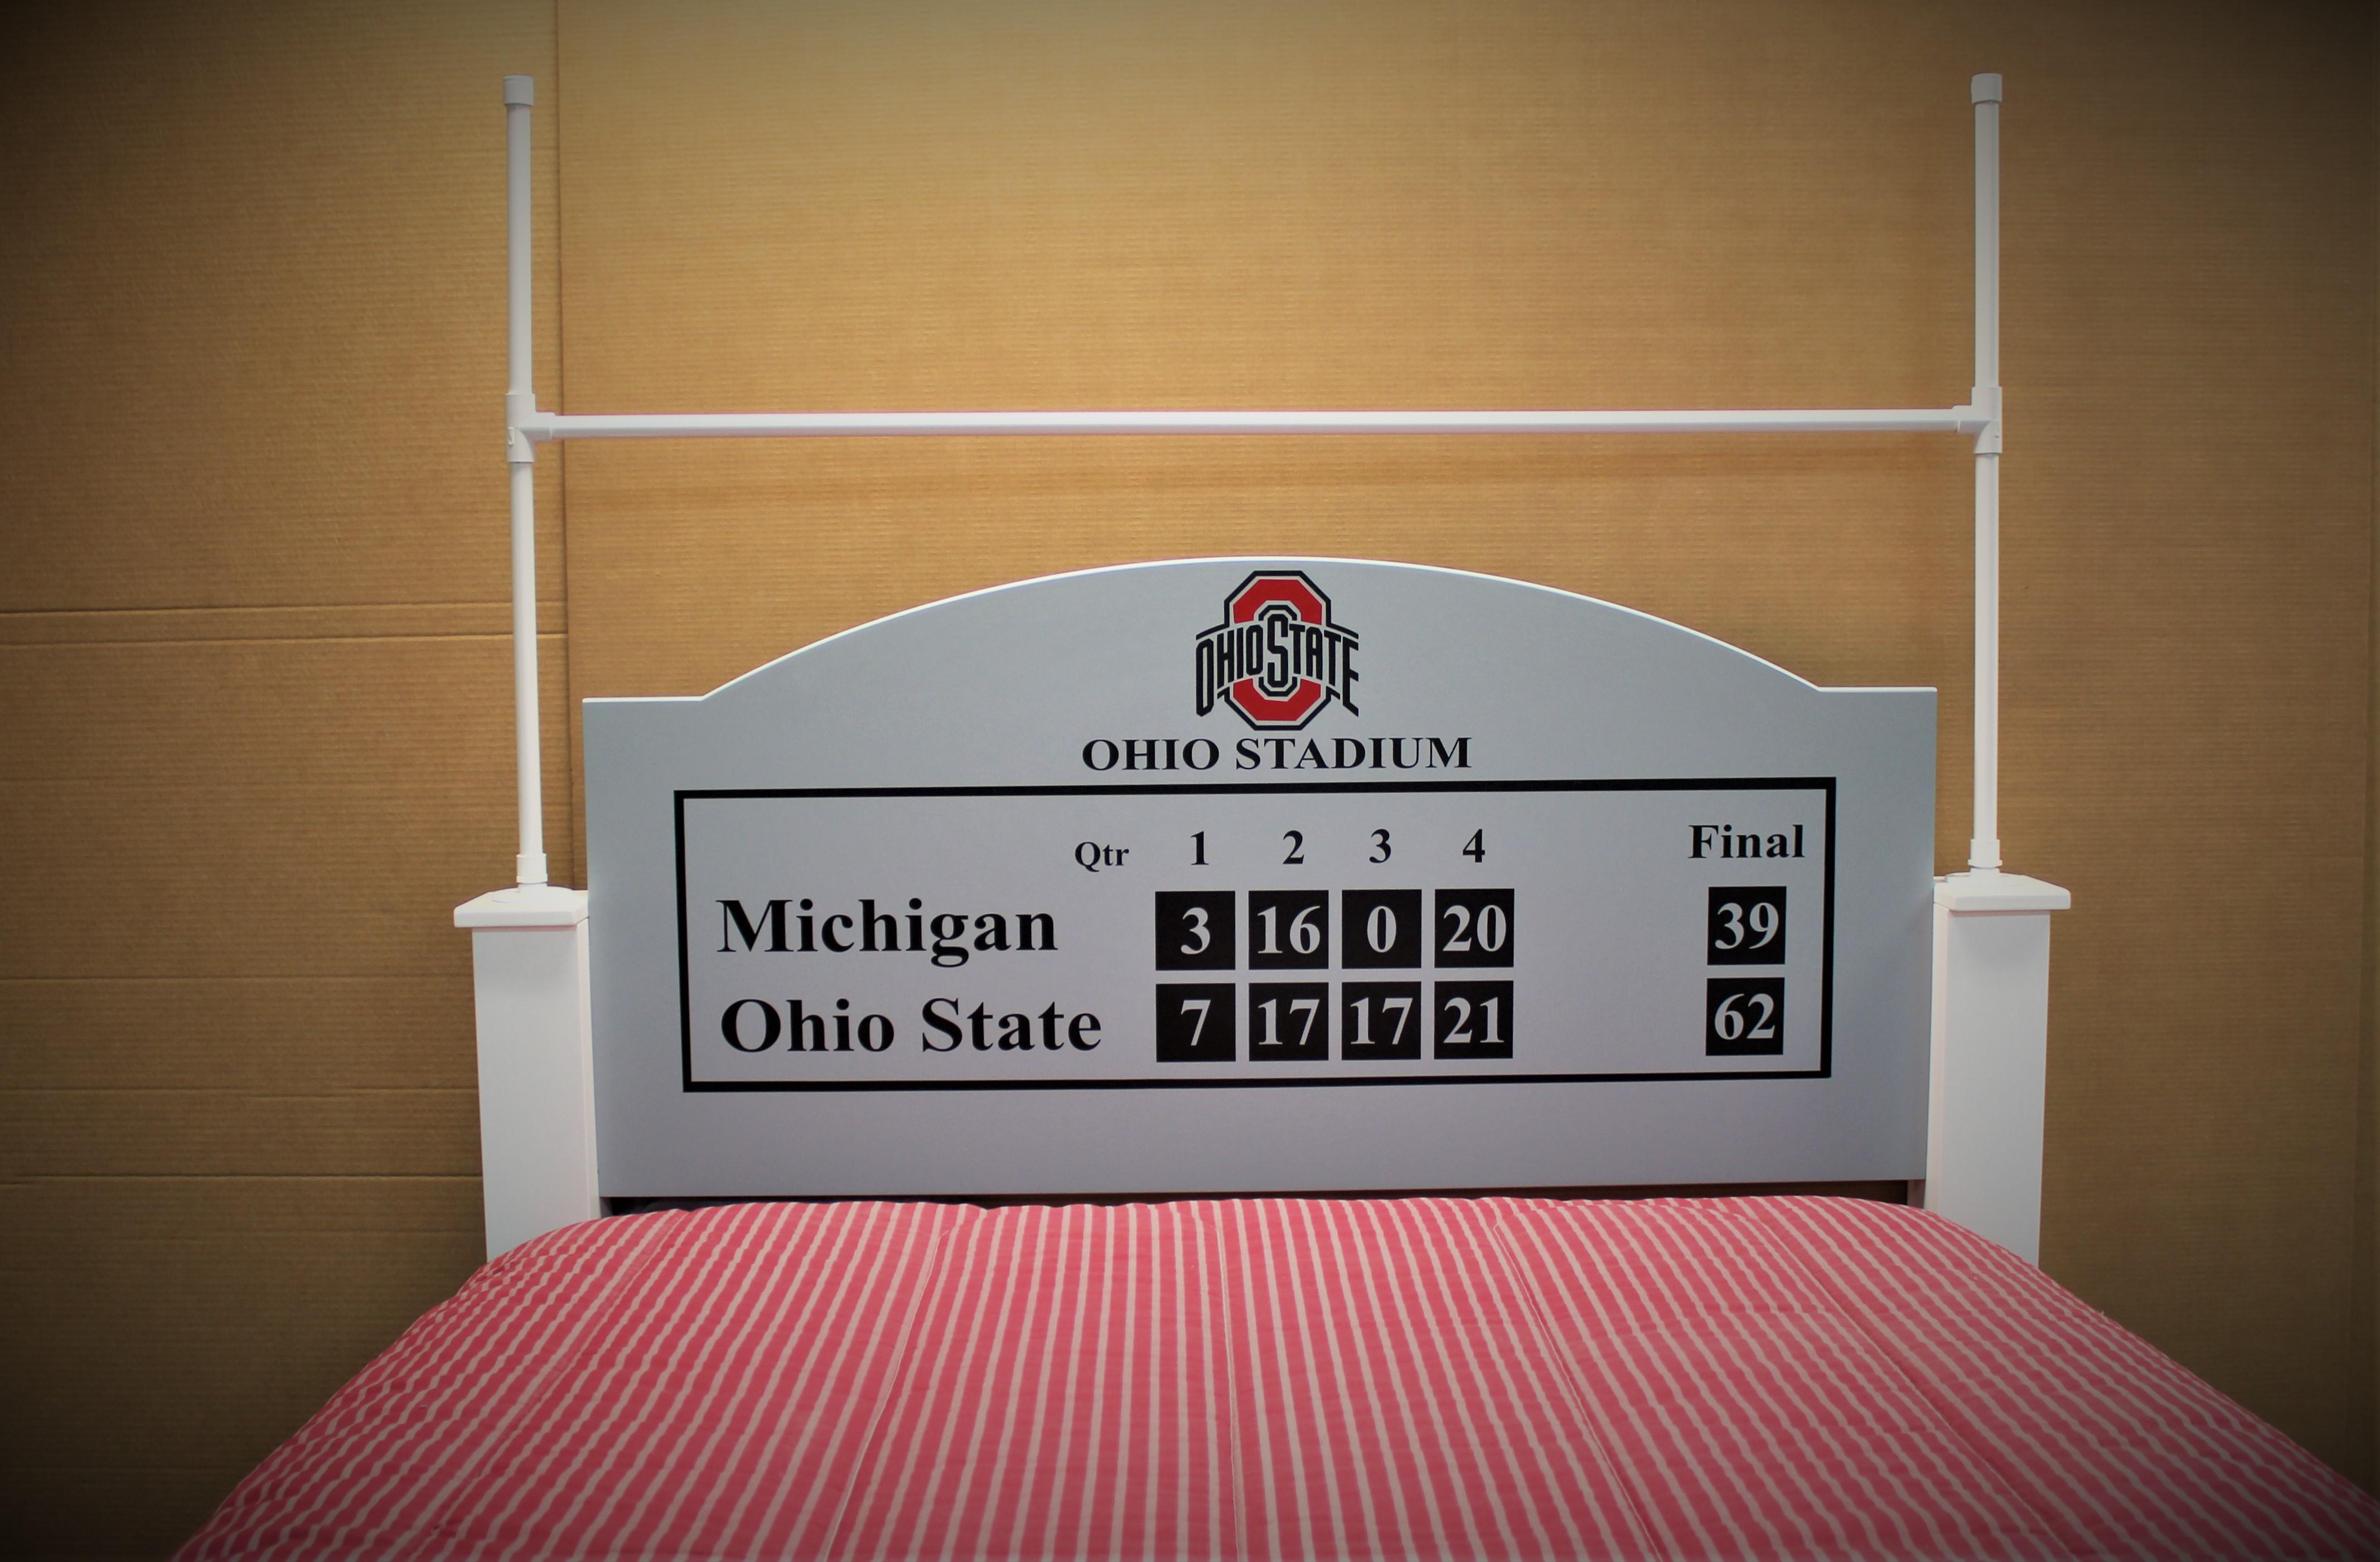 Full size Football Bed Headboard